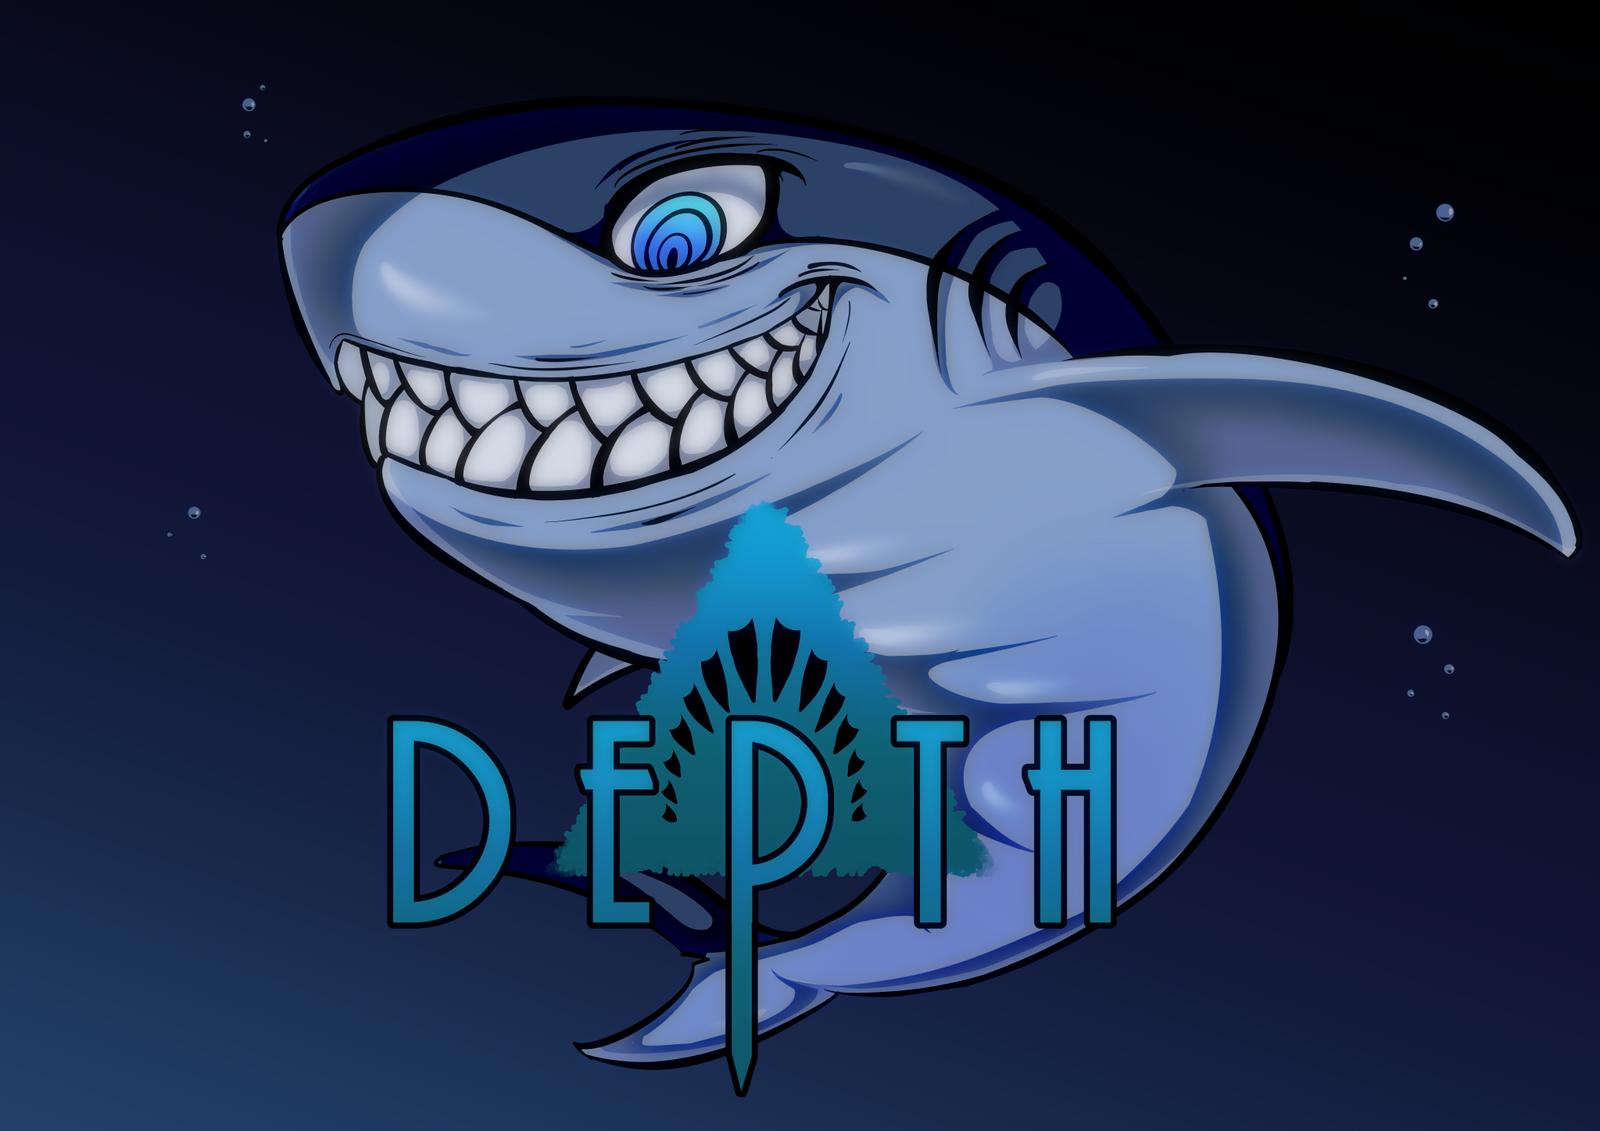 depth great white shark by robicraft on deviantart